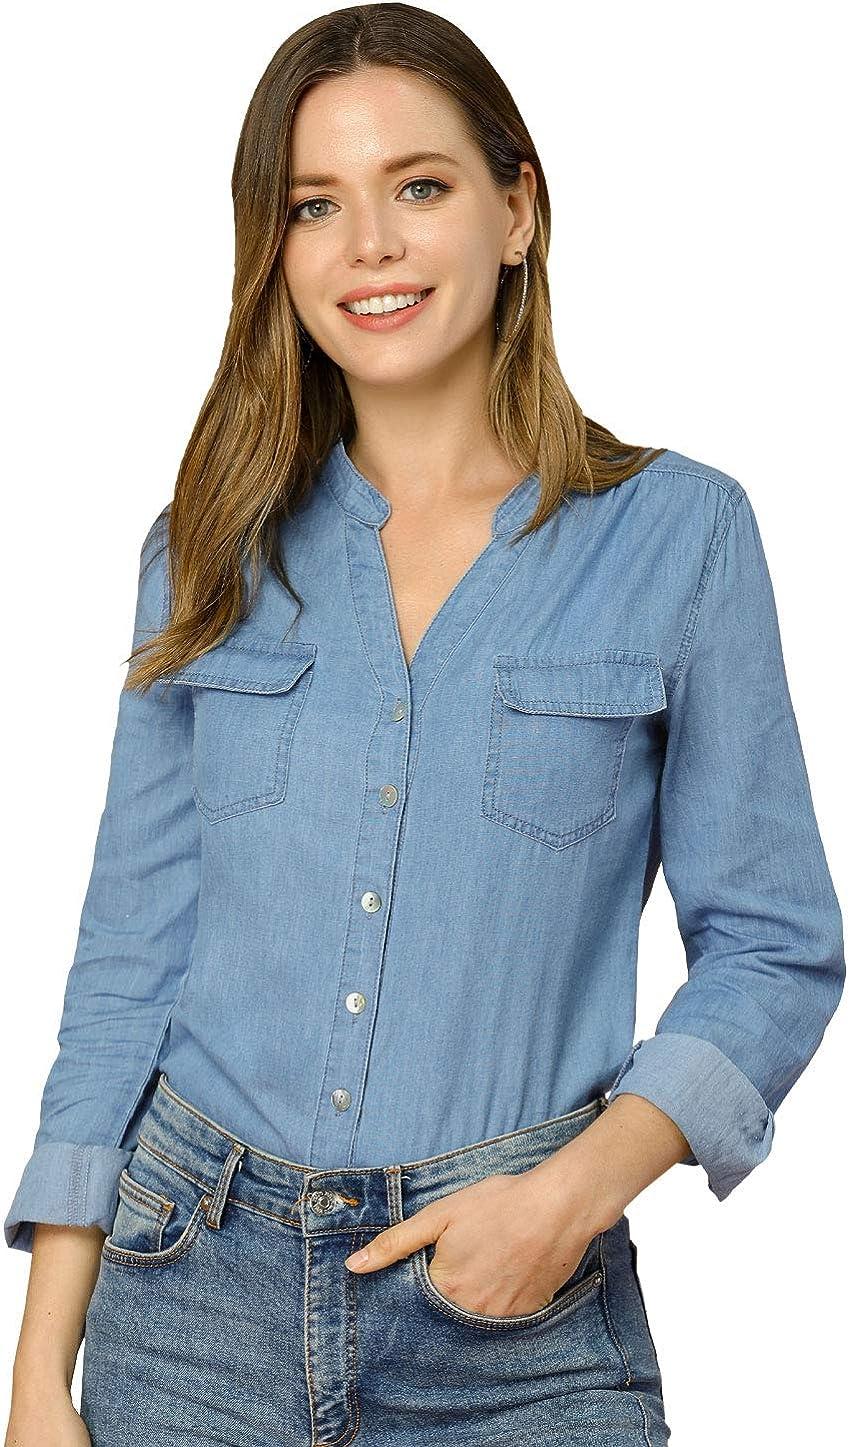 Allegra K Women's Denim Shirts Button Down Cotton Jean Top Blouse with Pockets